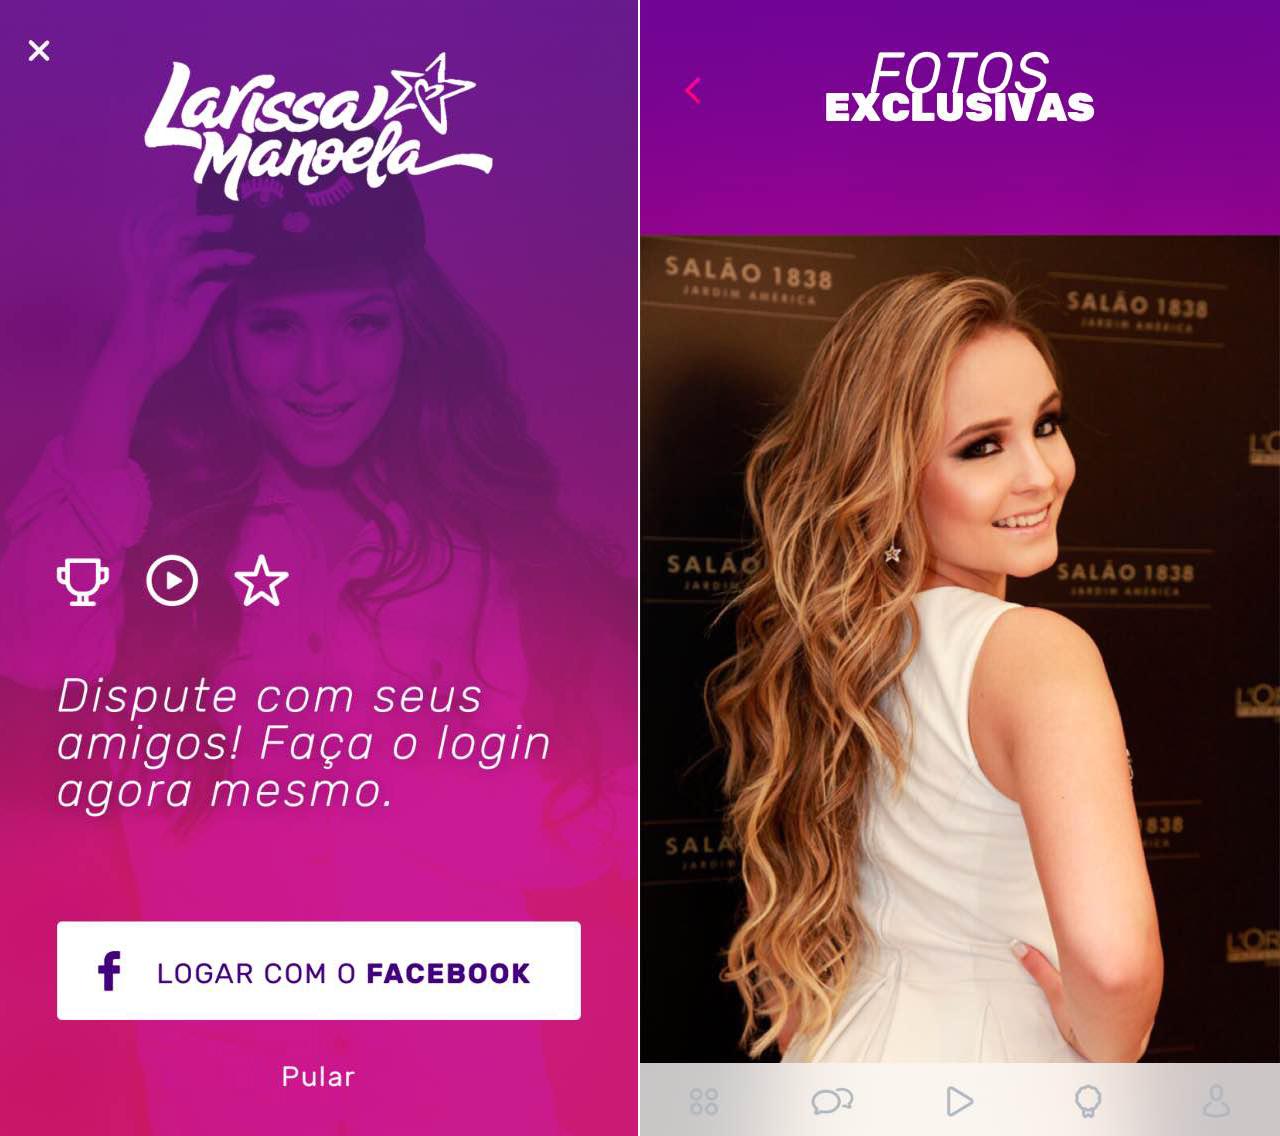 larissa-manoela-lanca-app